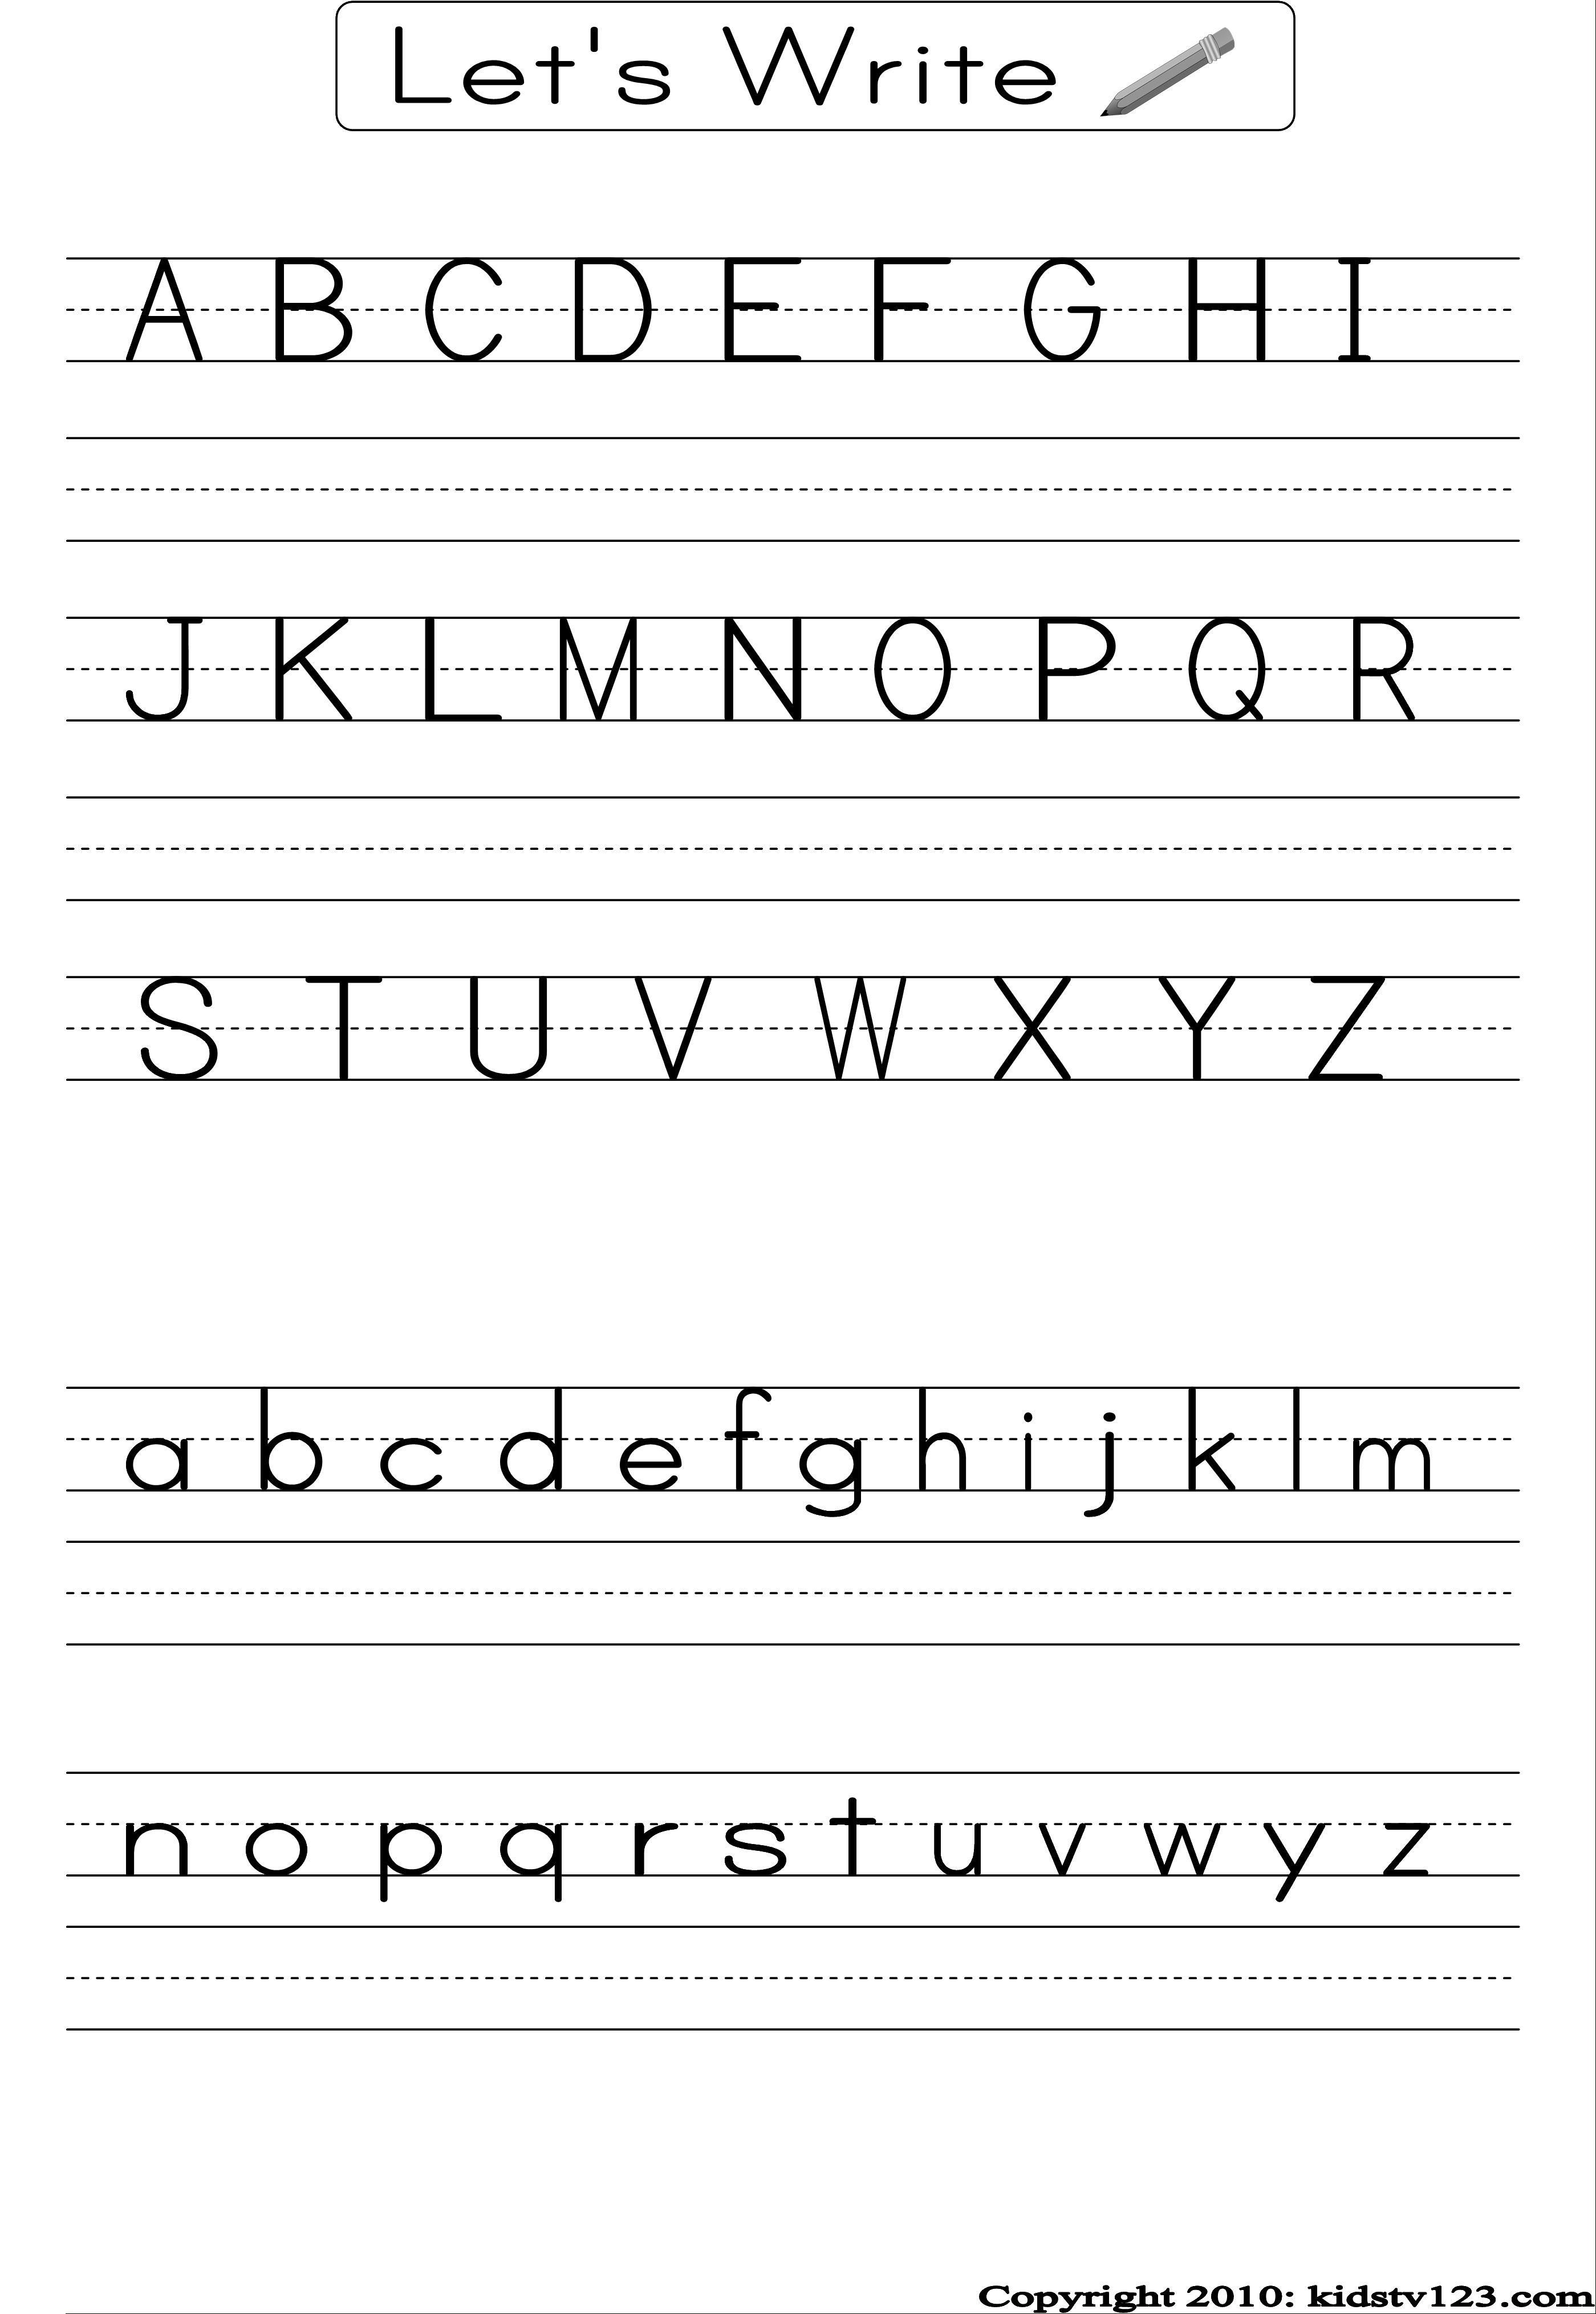 Free Printable Alphabet Worksheets, Preschool Writing And Pattern - Free Printable Alphabet Worksheets